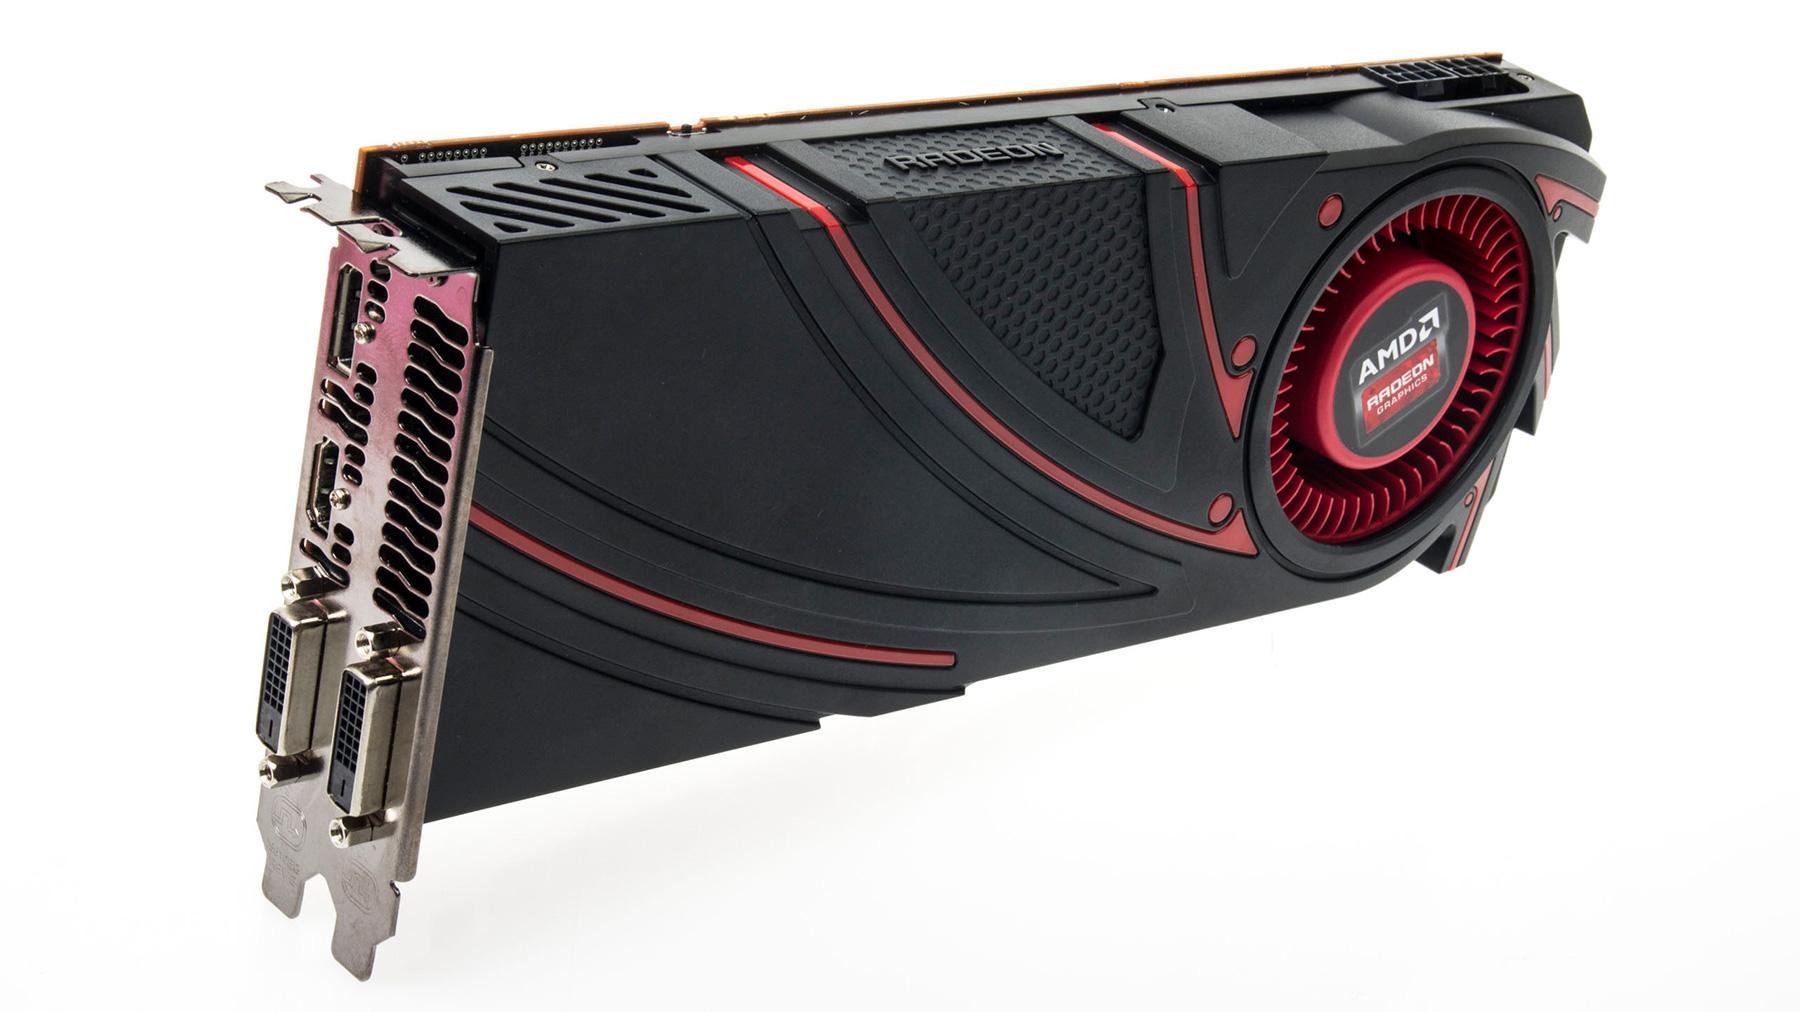 AMD Radeon R9 290X.Foto: Varg Aamo, Hardware.no